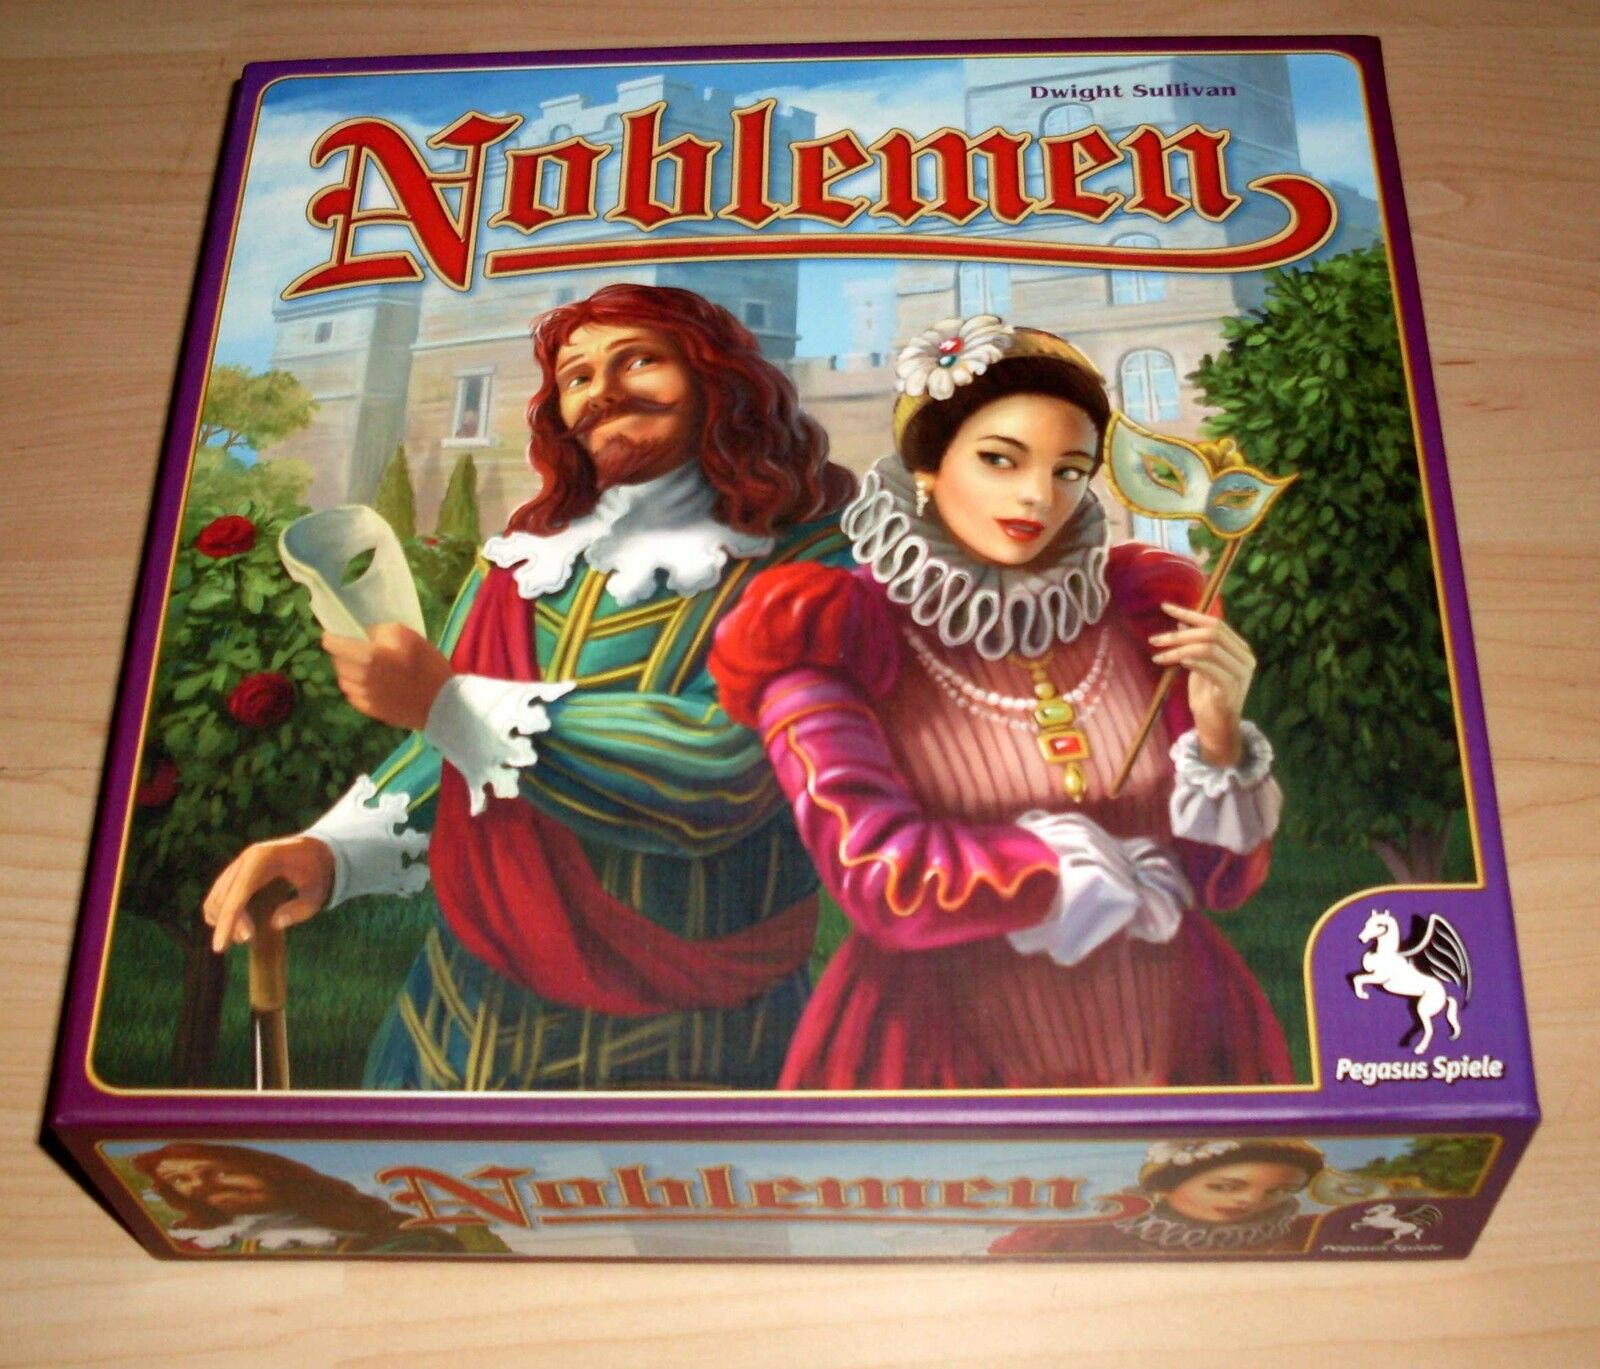 Brettspiel - Noblemen - 4250231738005 - Pegasus Spiele Spiele Spiele - Gesellschaftsspiel 7839aa